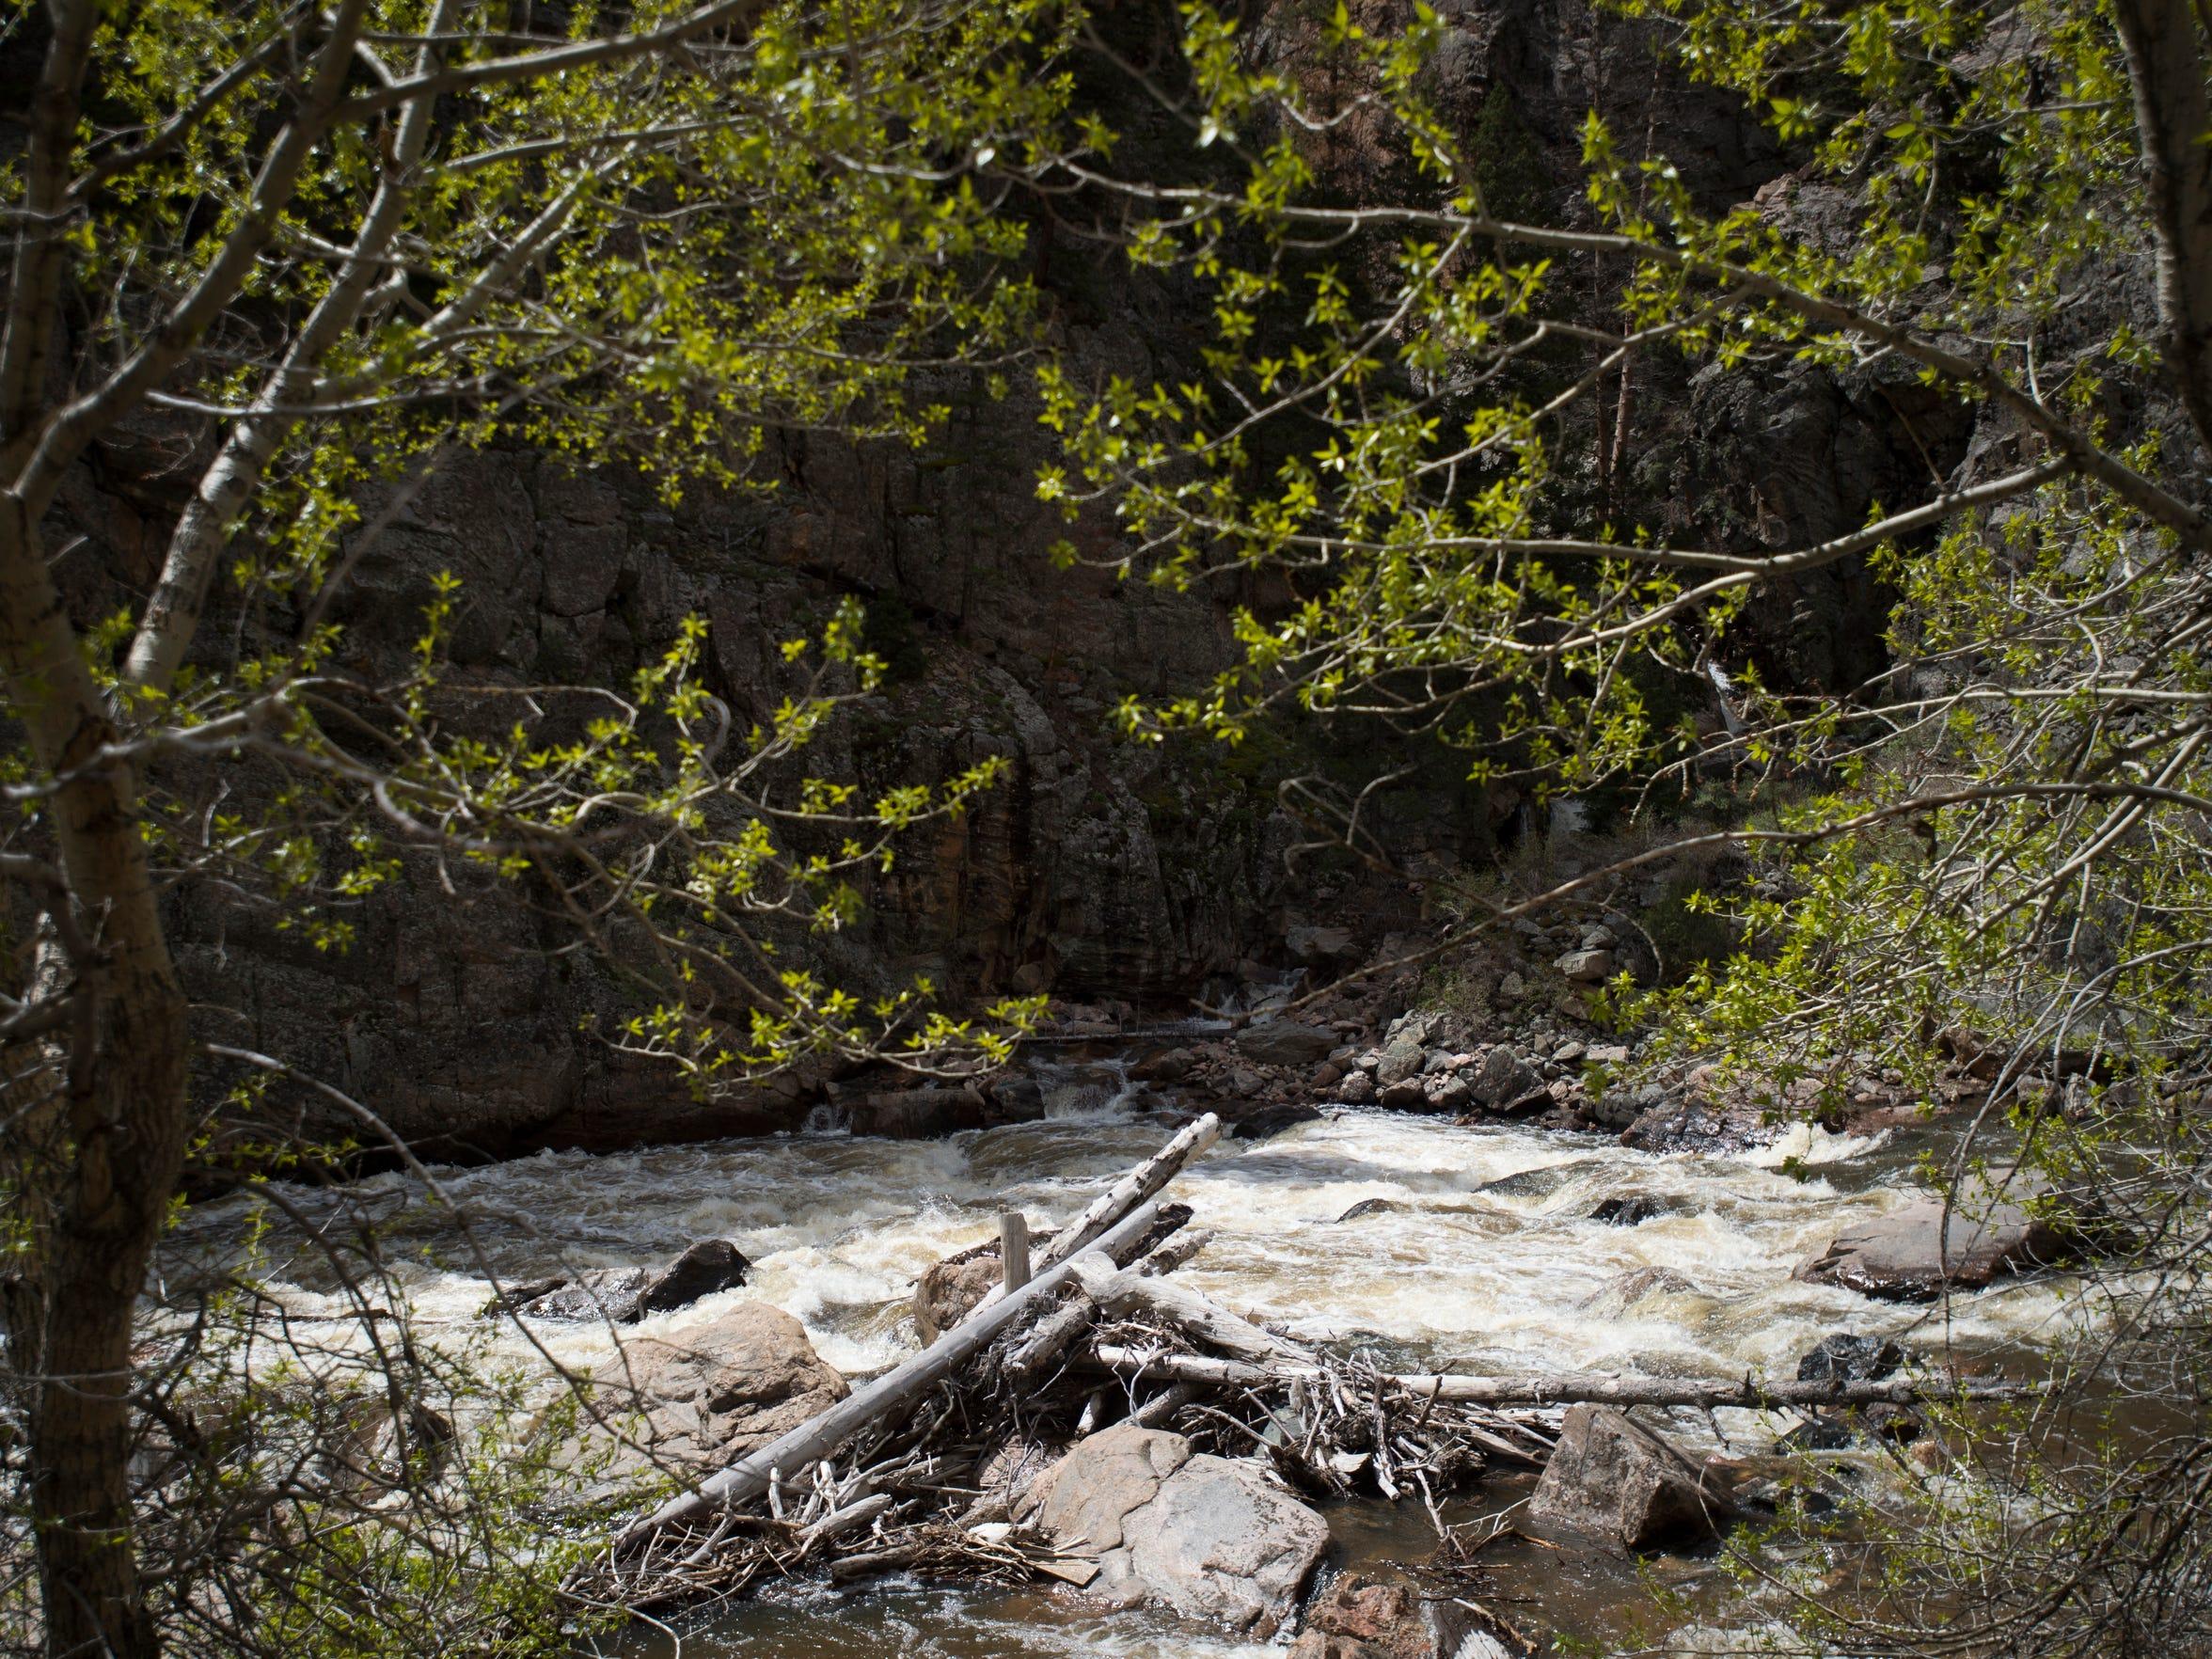 The Cache la Poudre River flows through Poudre Canyon